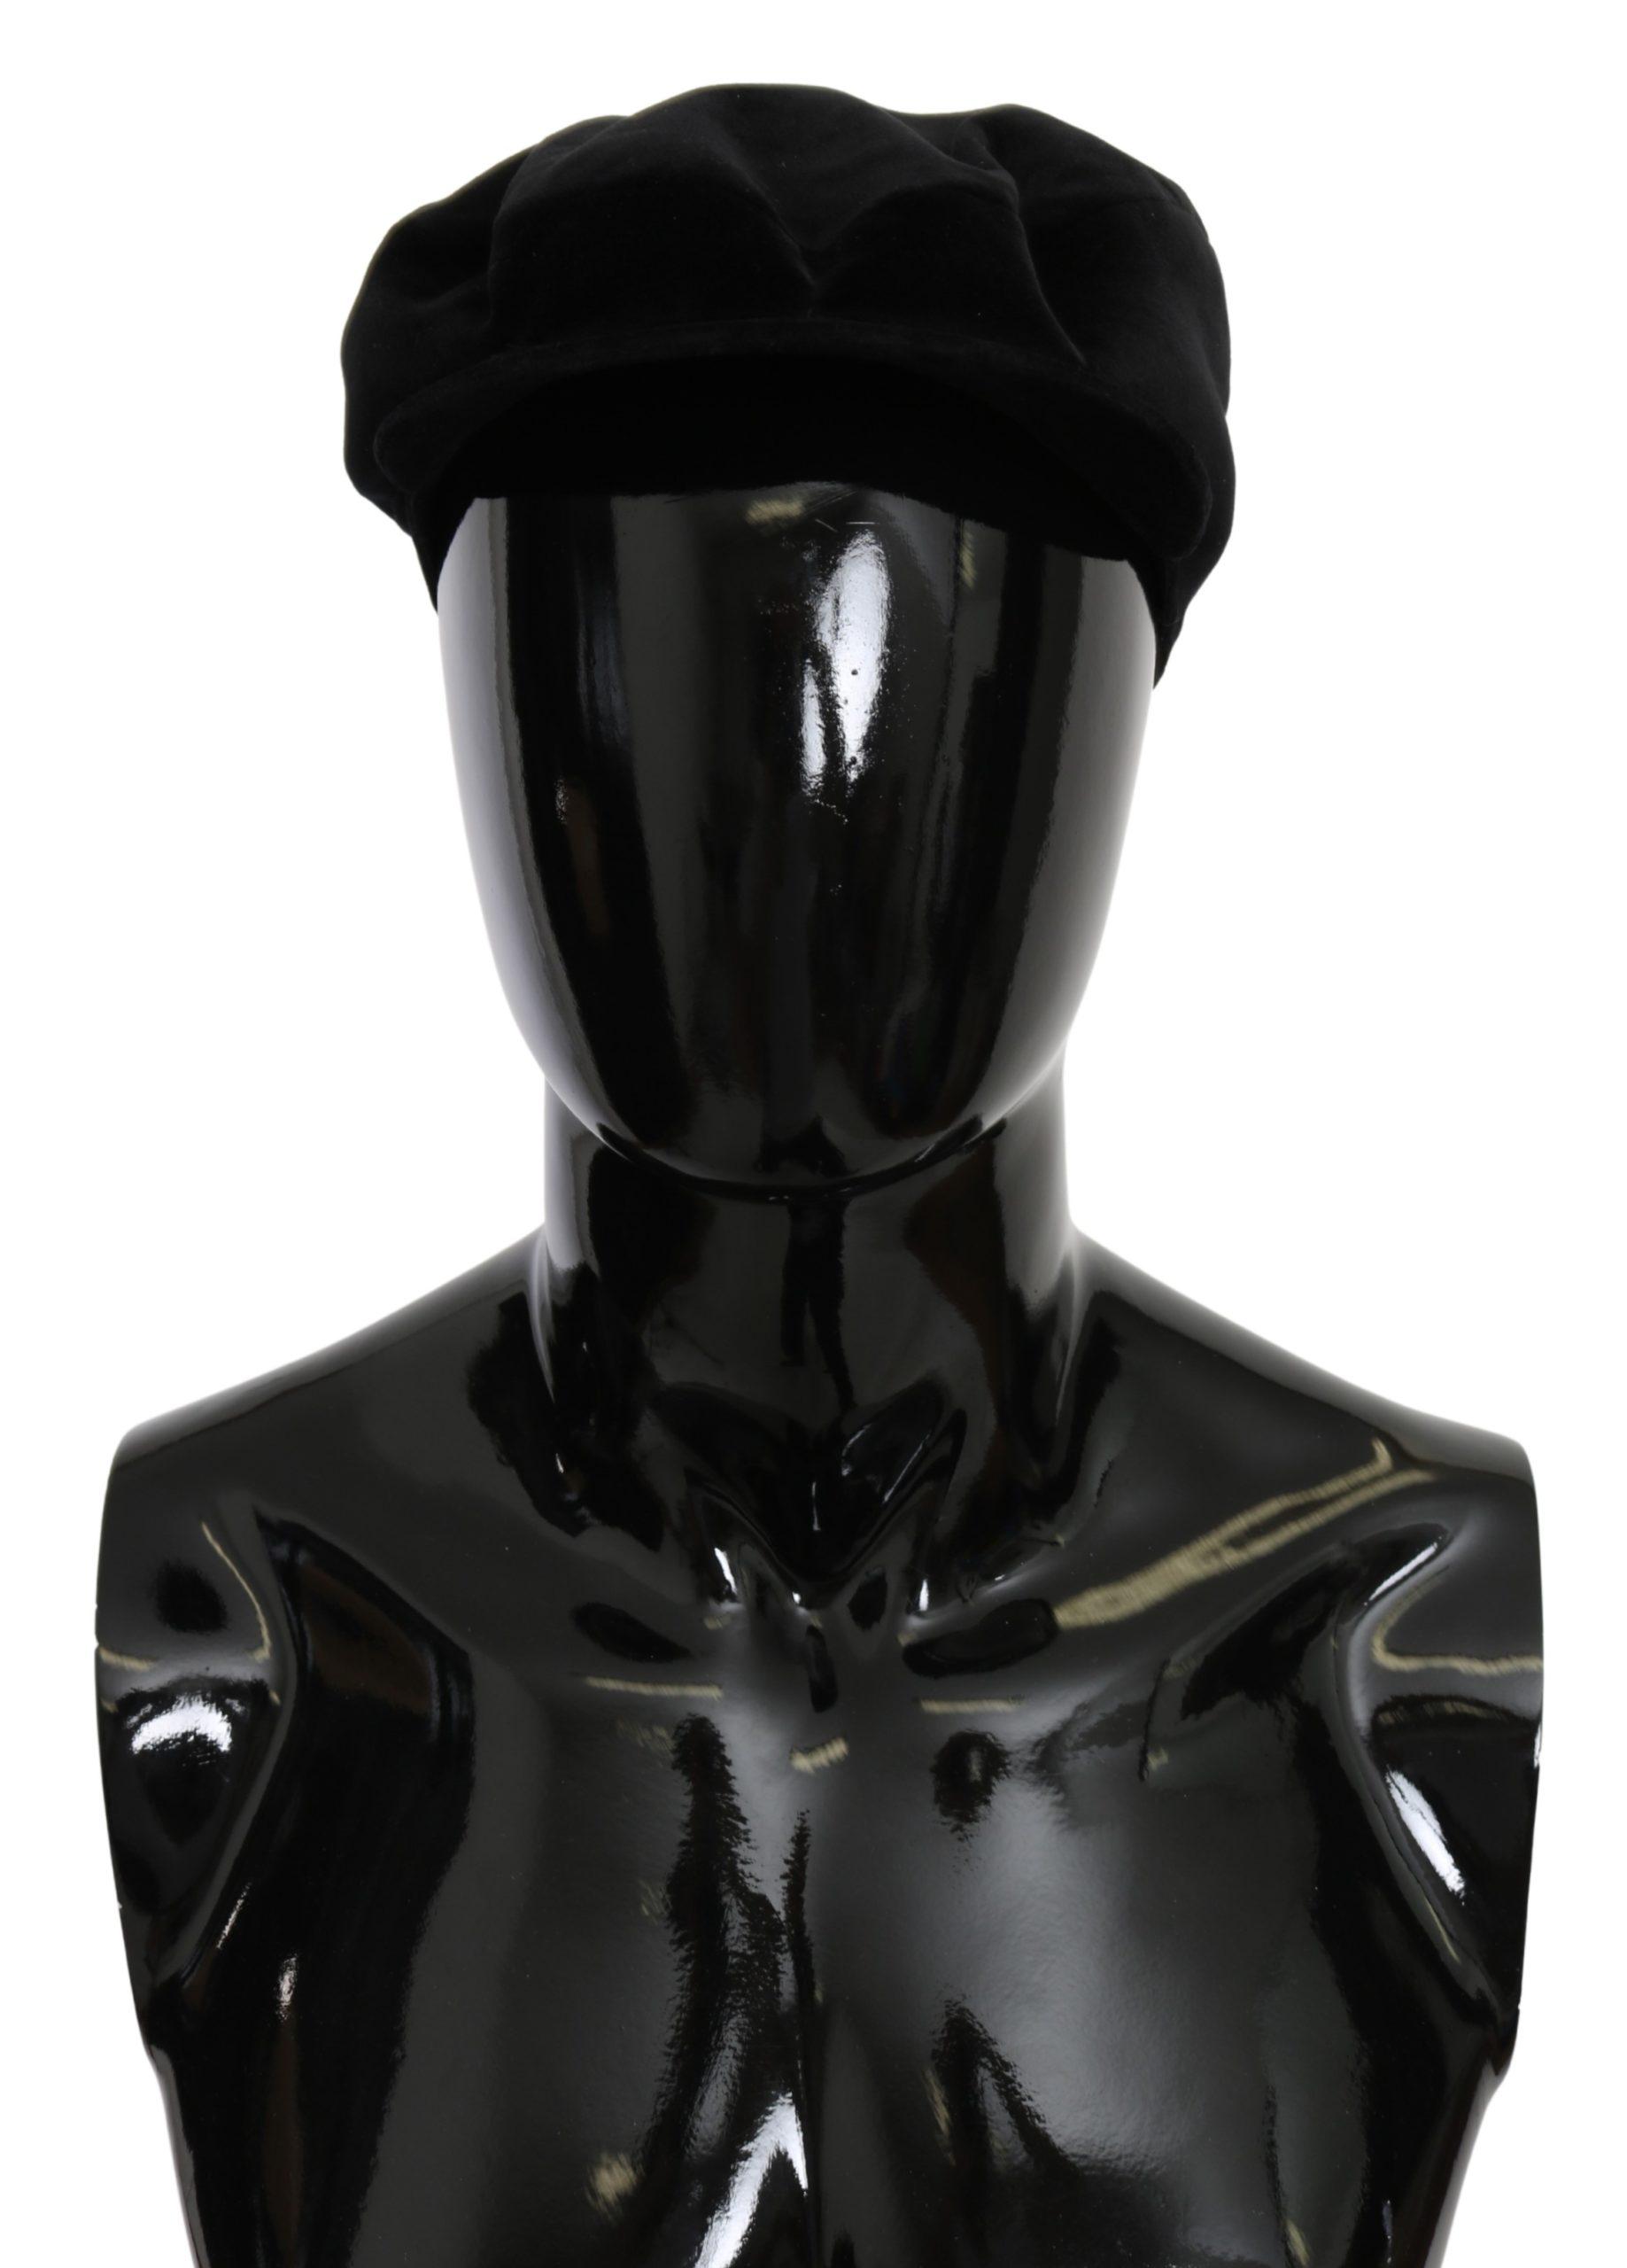 Dolce & Gabbana Men's Capello Cotton Stretch Hat Black HAT9090 - 58 cm M